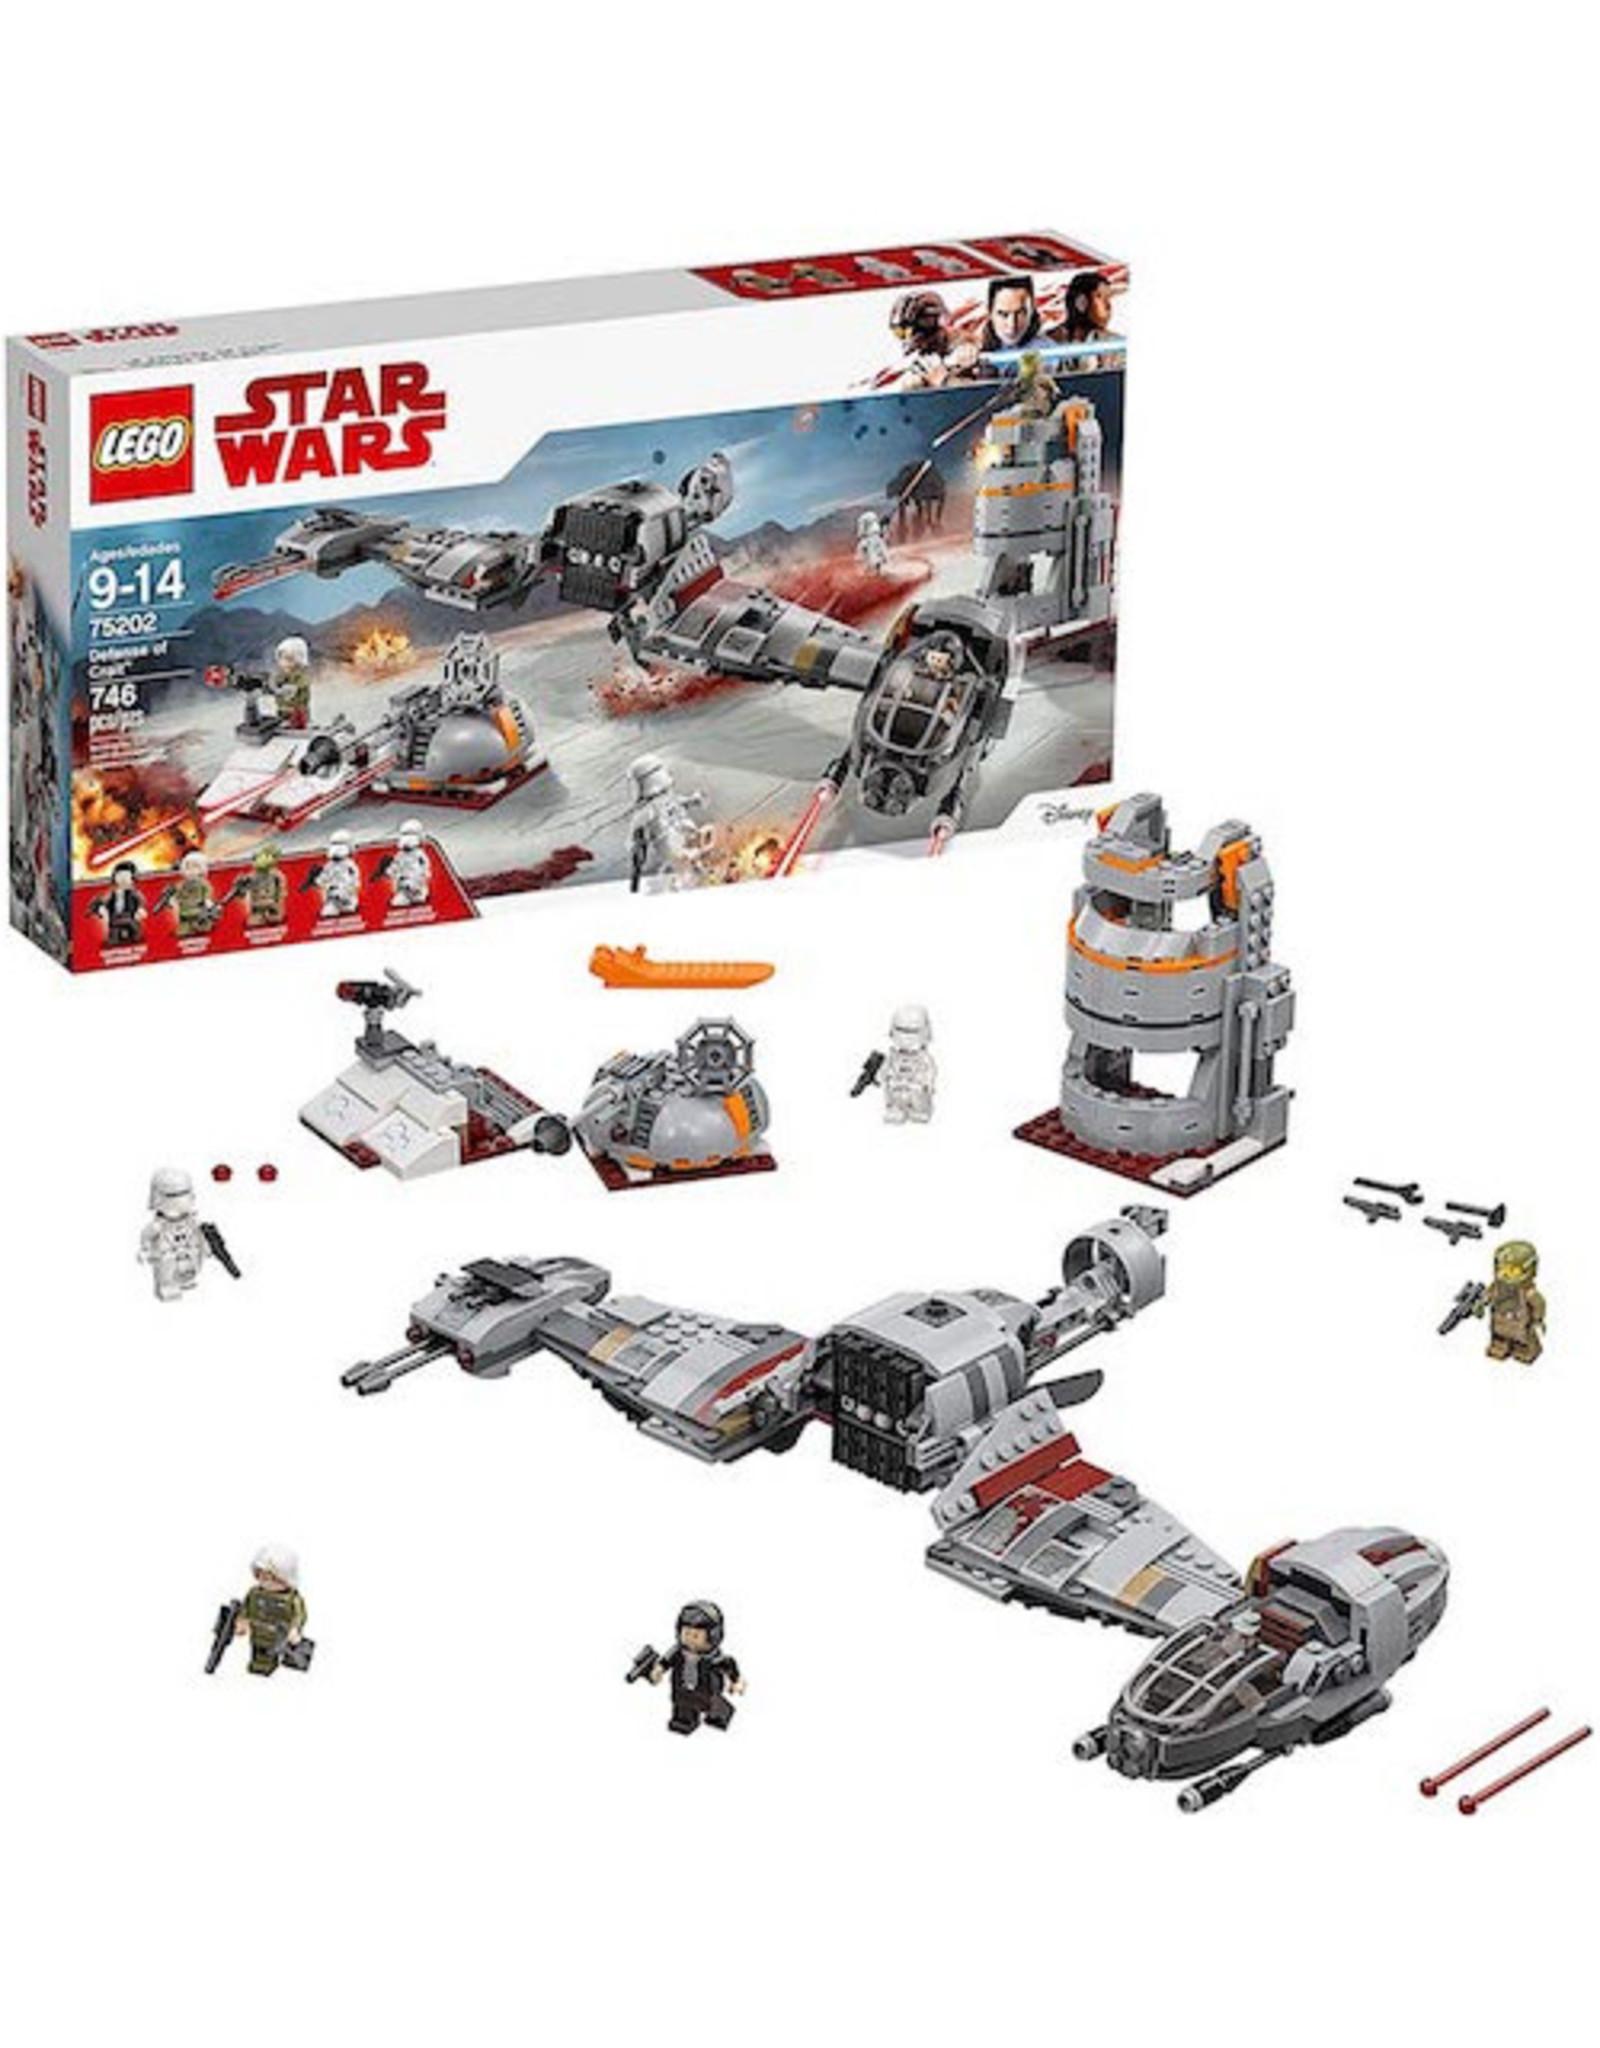 Lego Lego - Star Wars: The Last Jedi Defense of Crait 75202